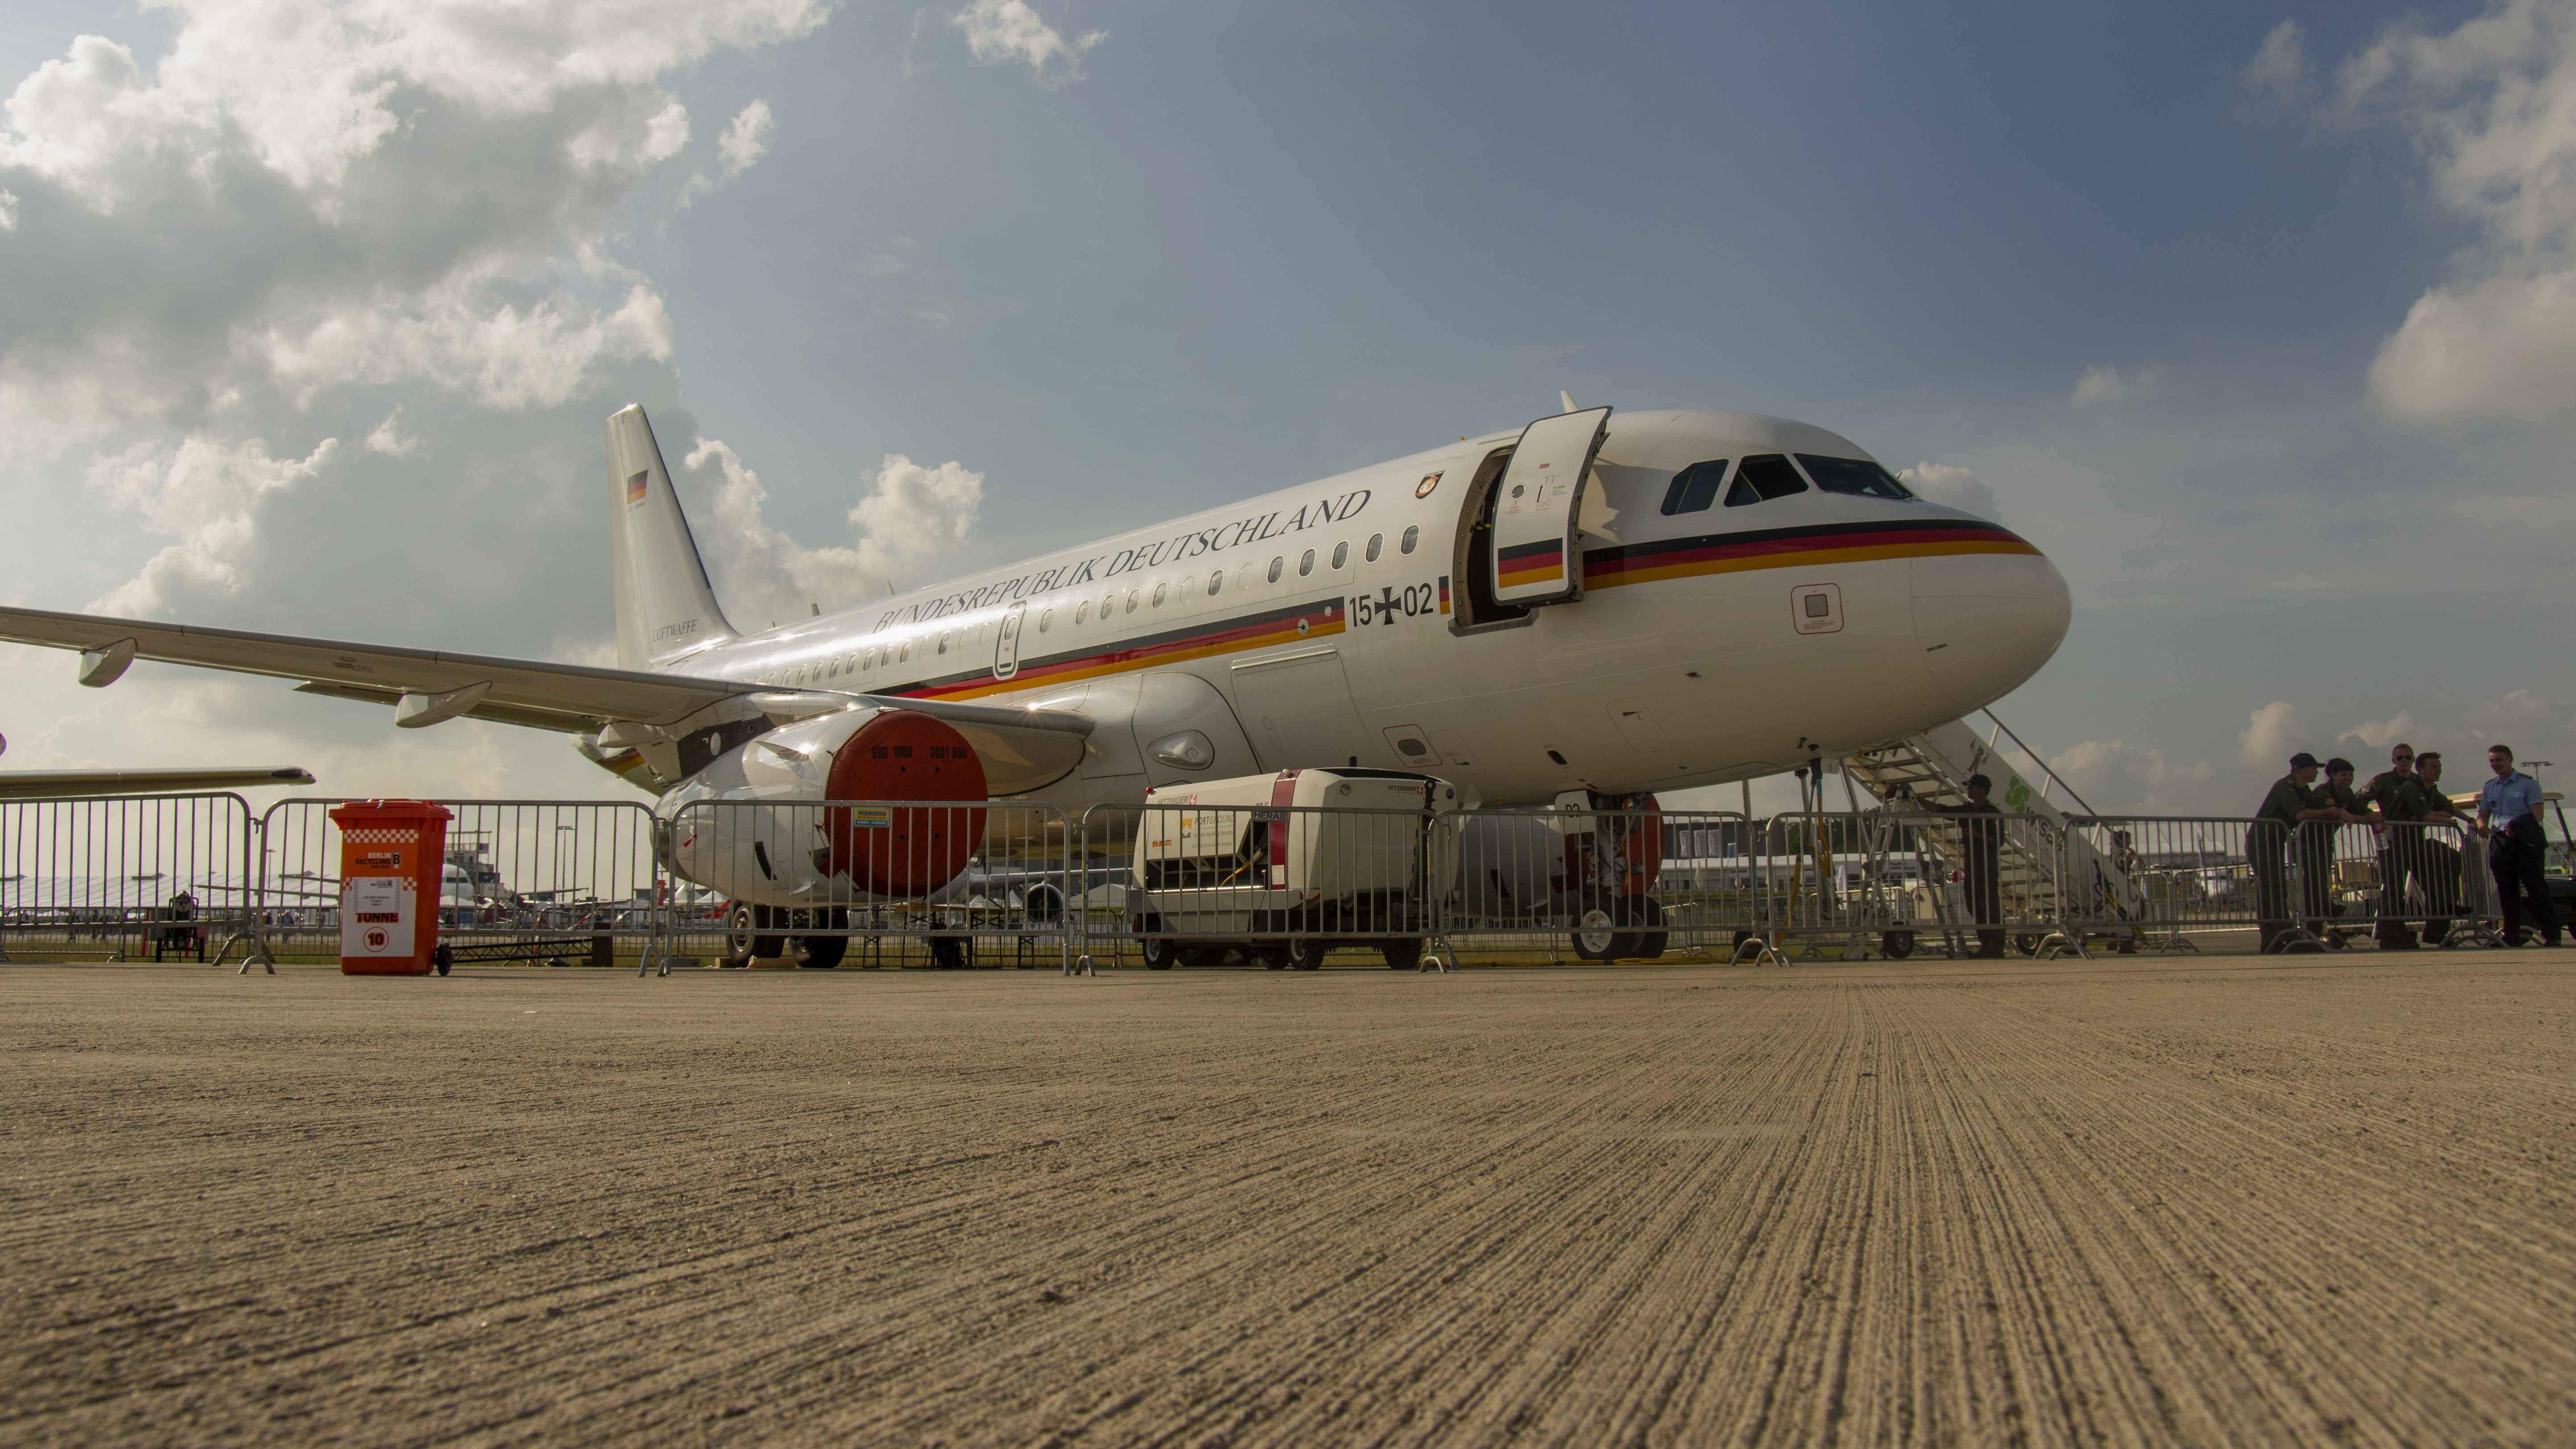 _IMG2283 Airbus ACJ319 A319-115CJ 15+02 German Air Force